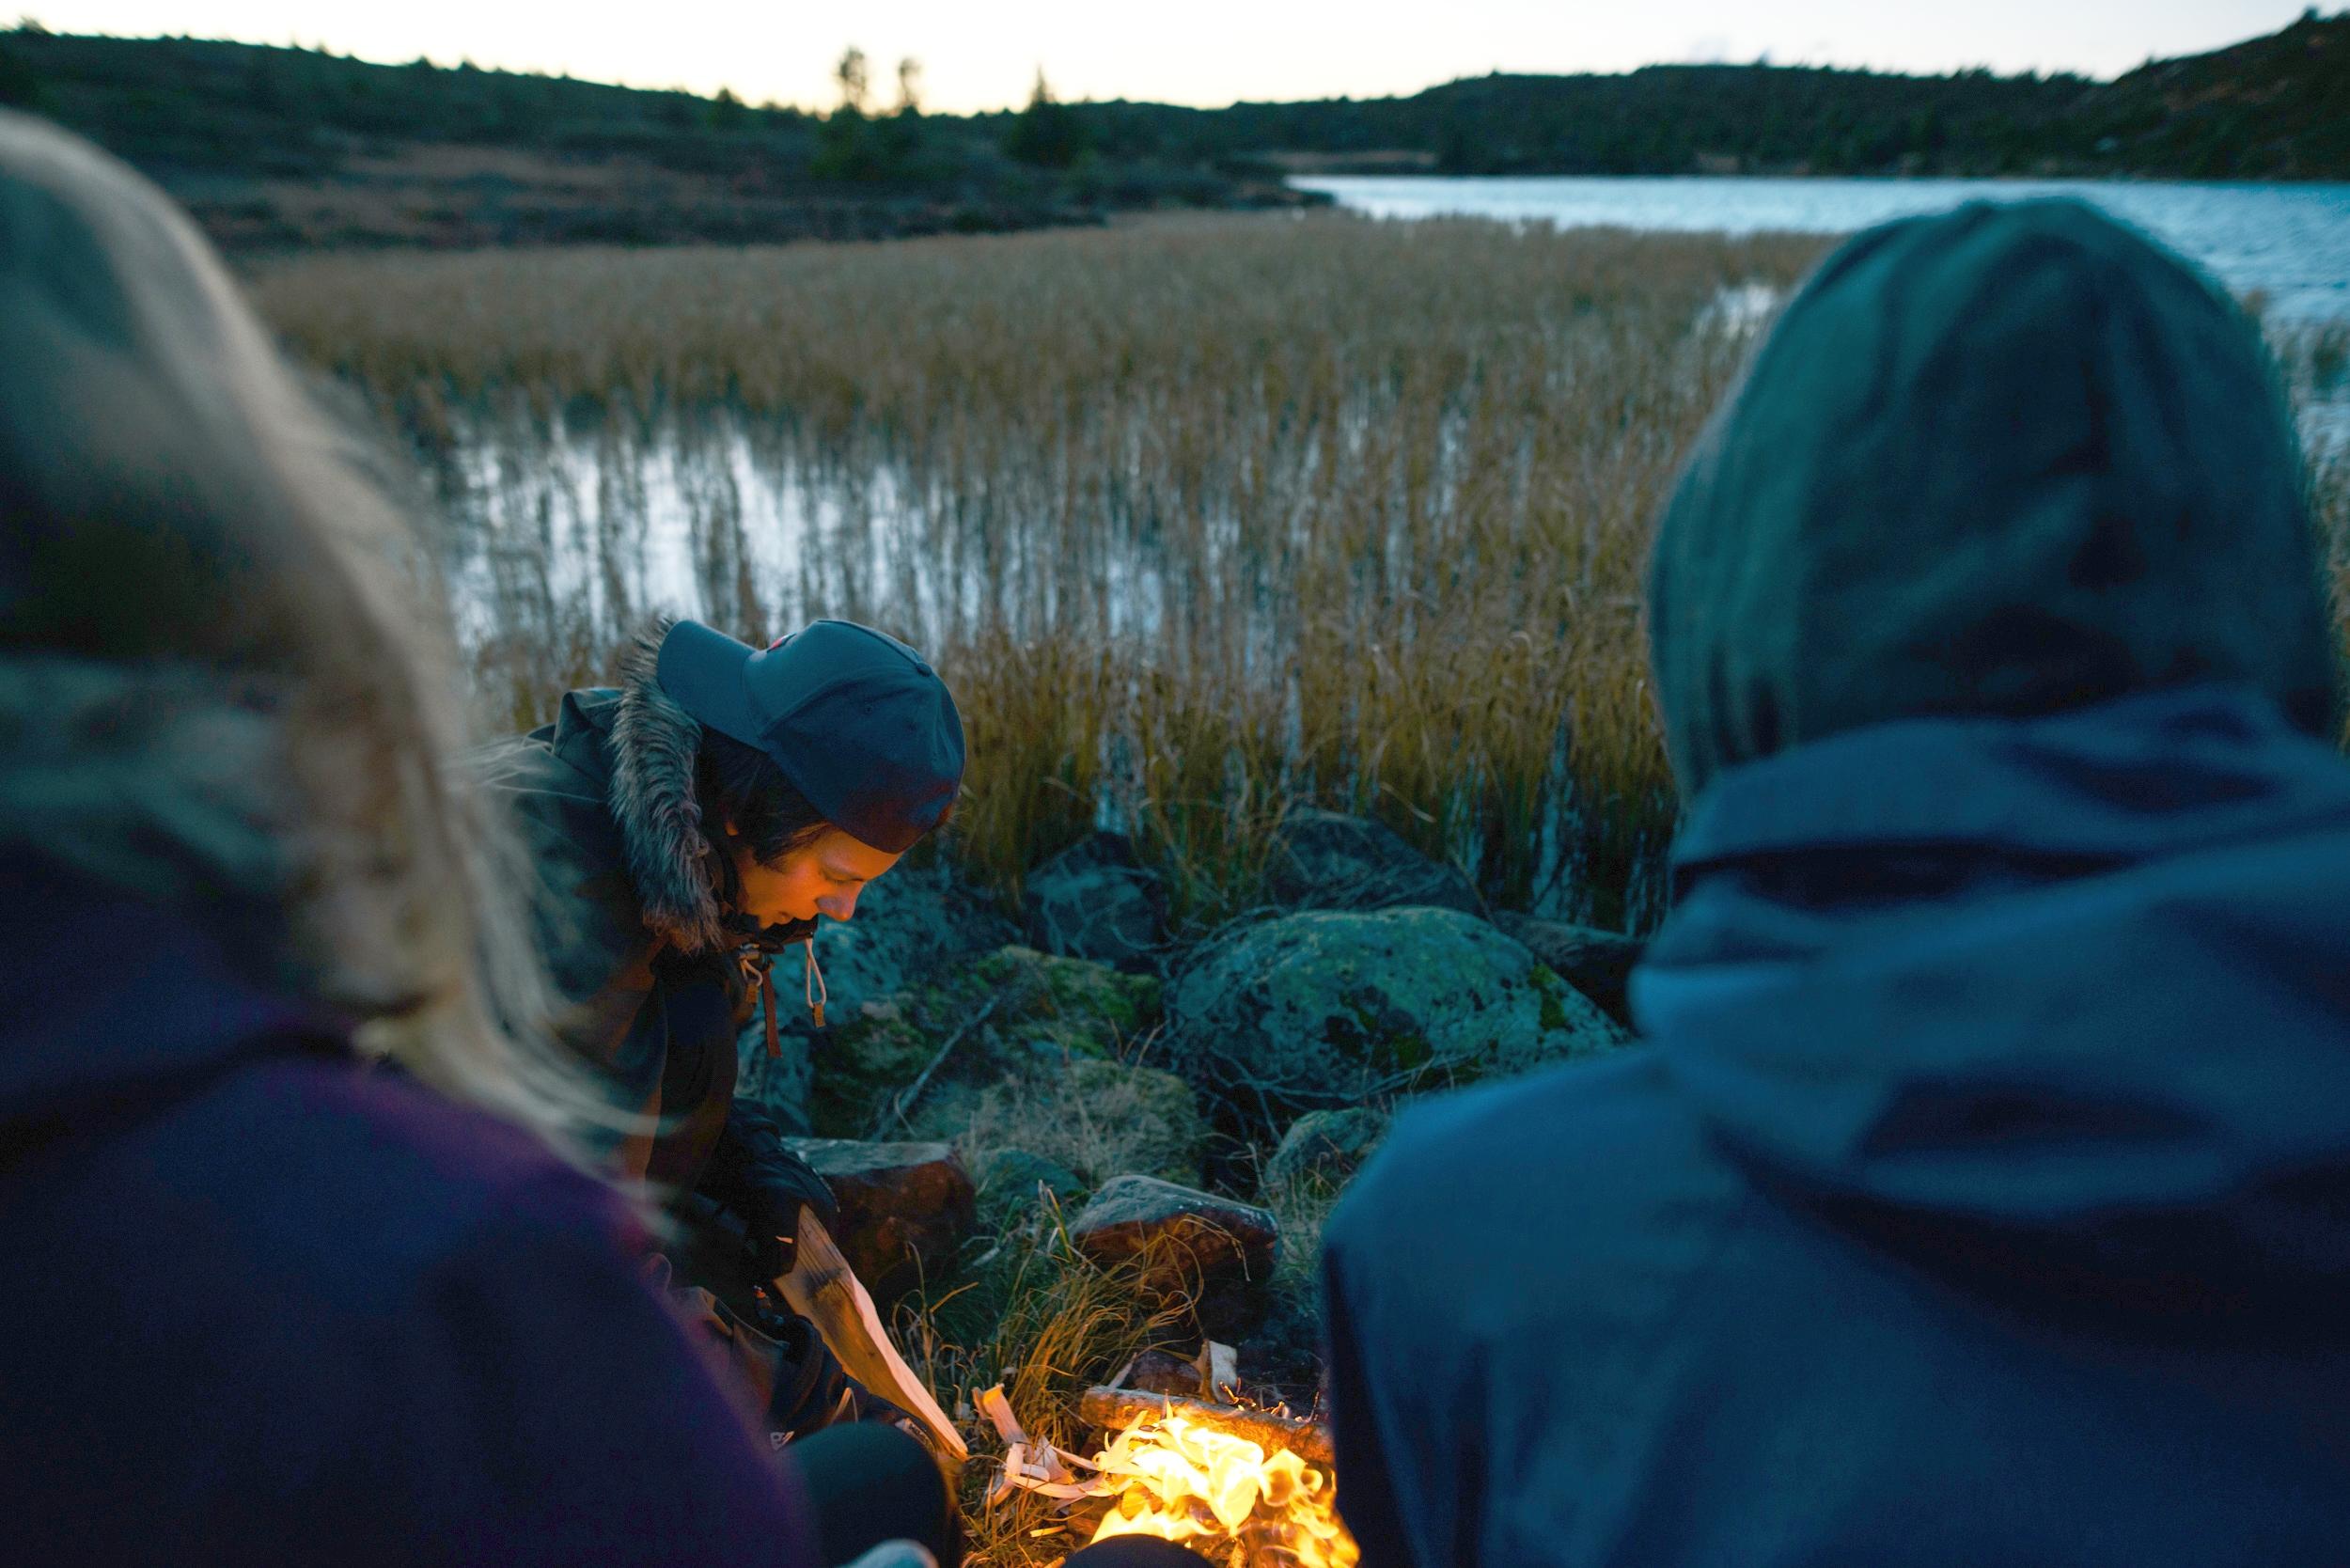 norskmestring's villmarksterapi program. Photo: Pictureaid